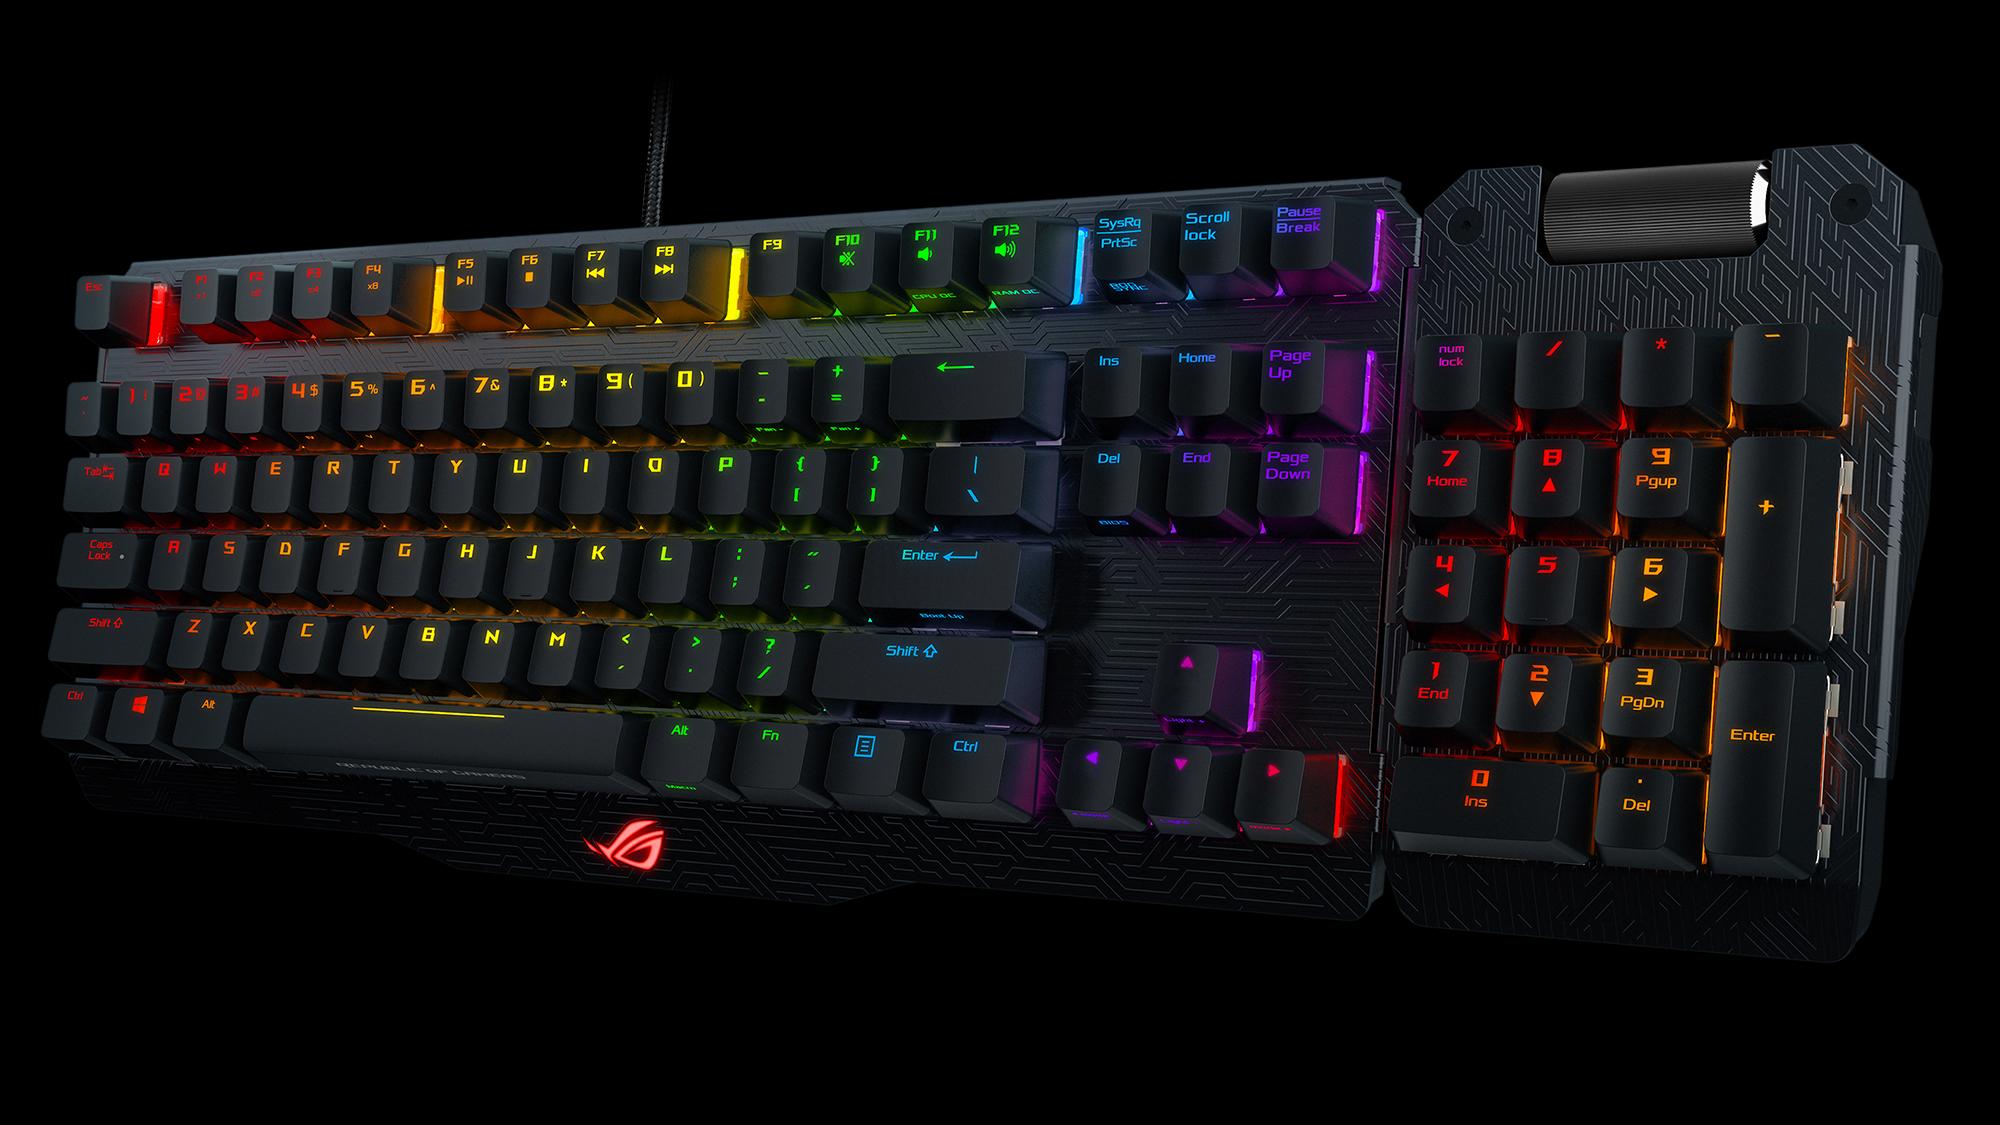 Rog Keyboard Rog Republic Of Gamers Global